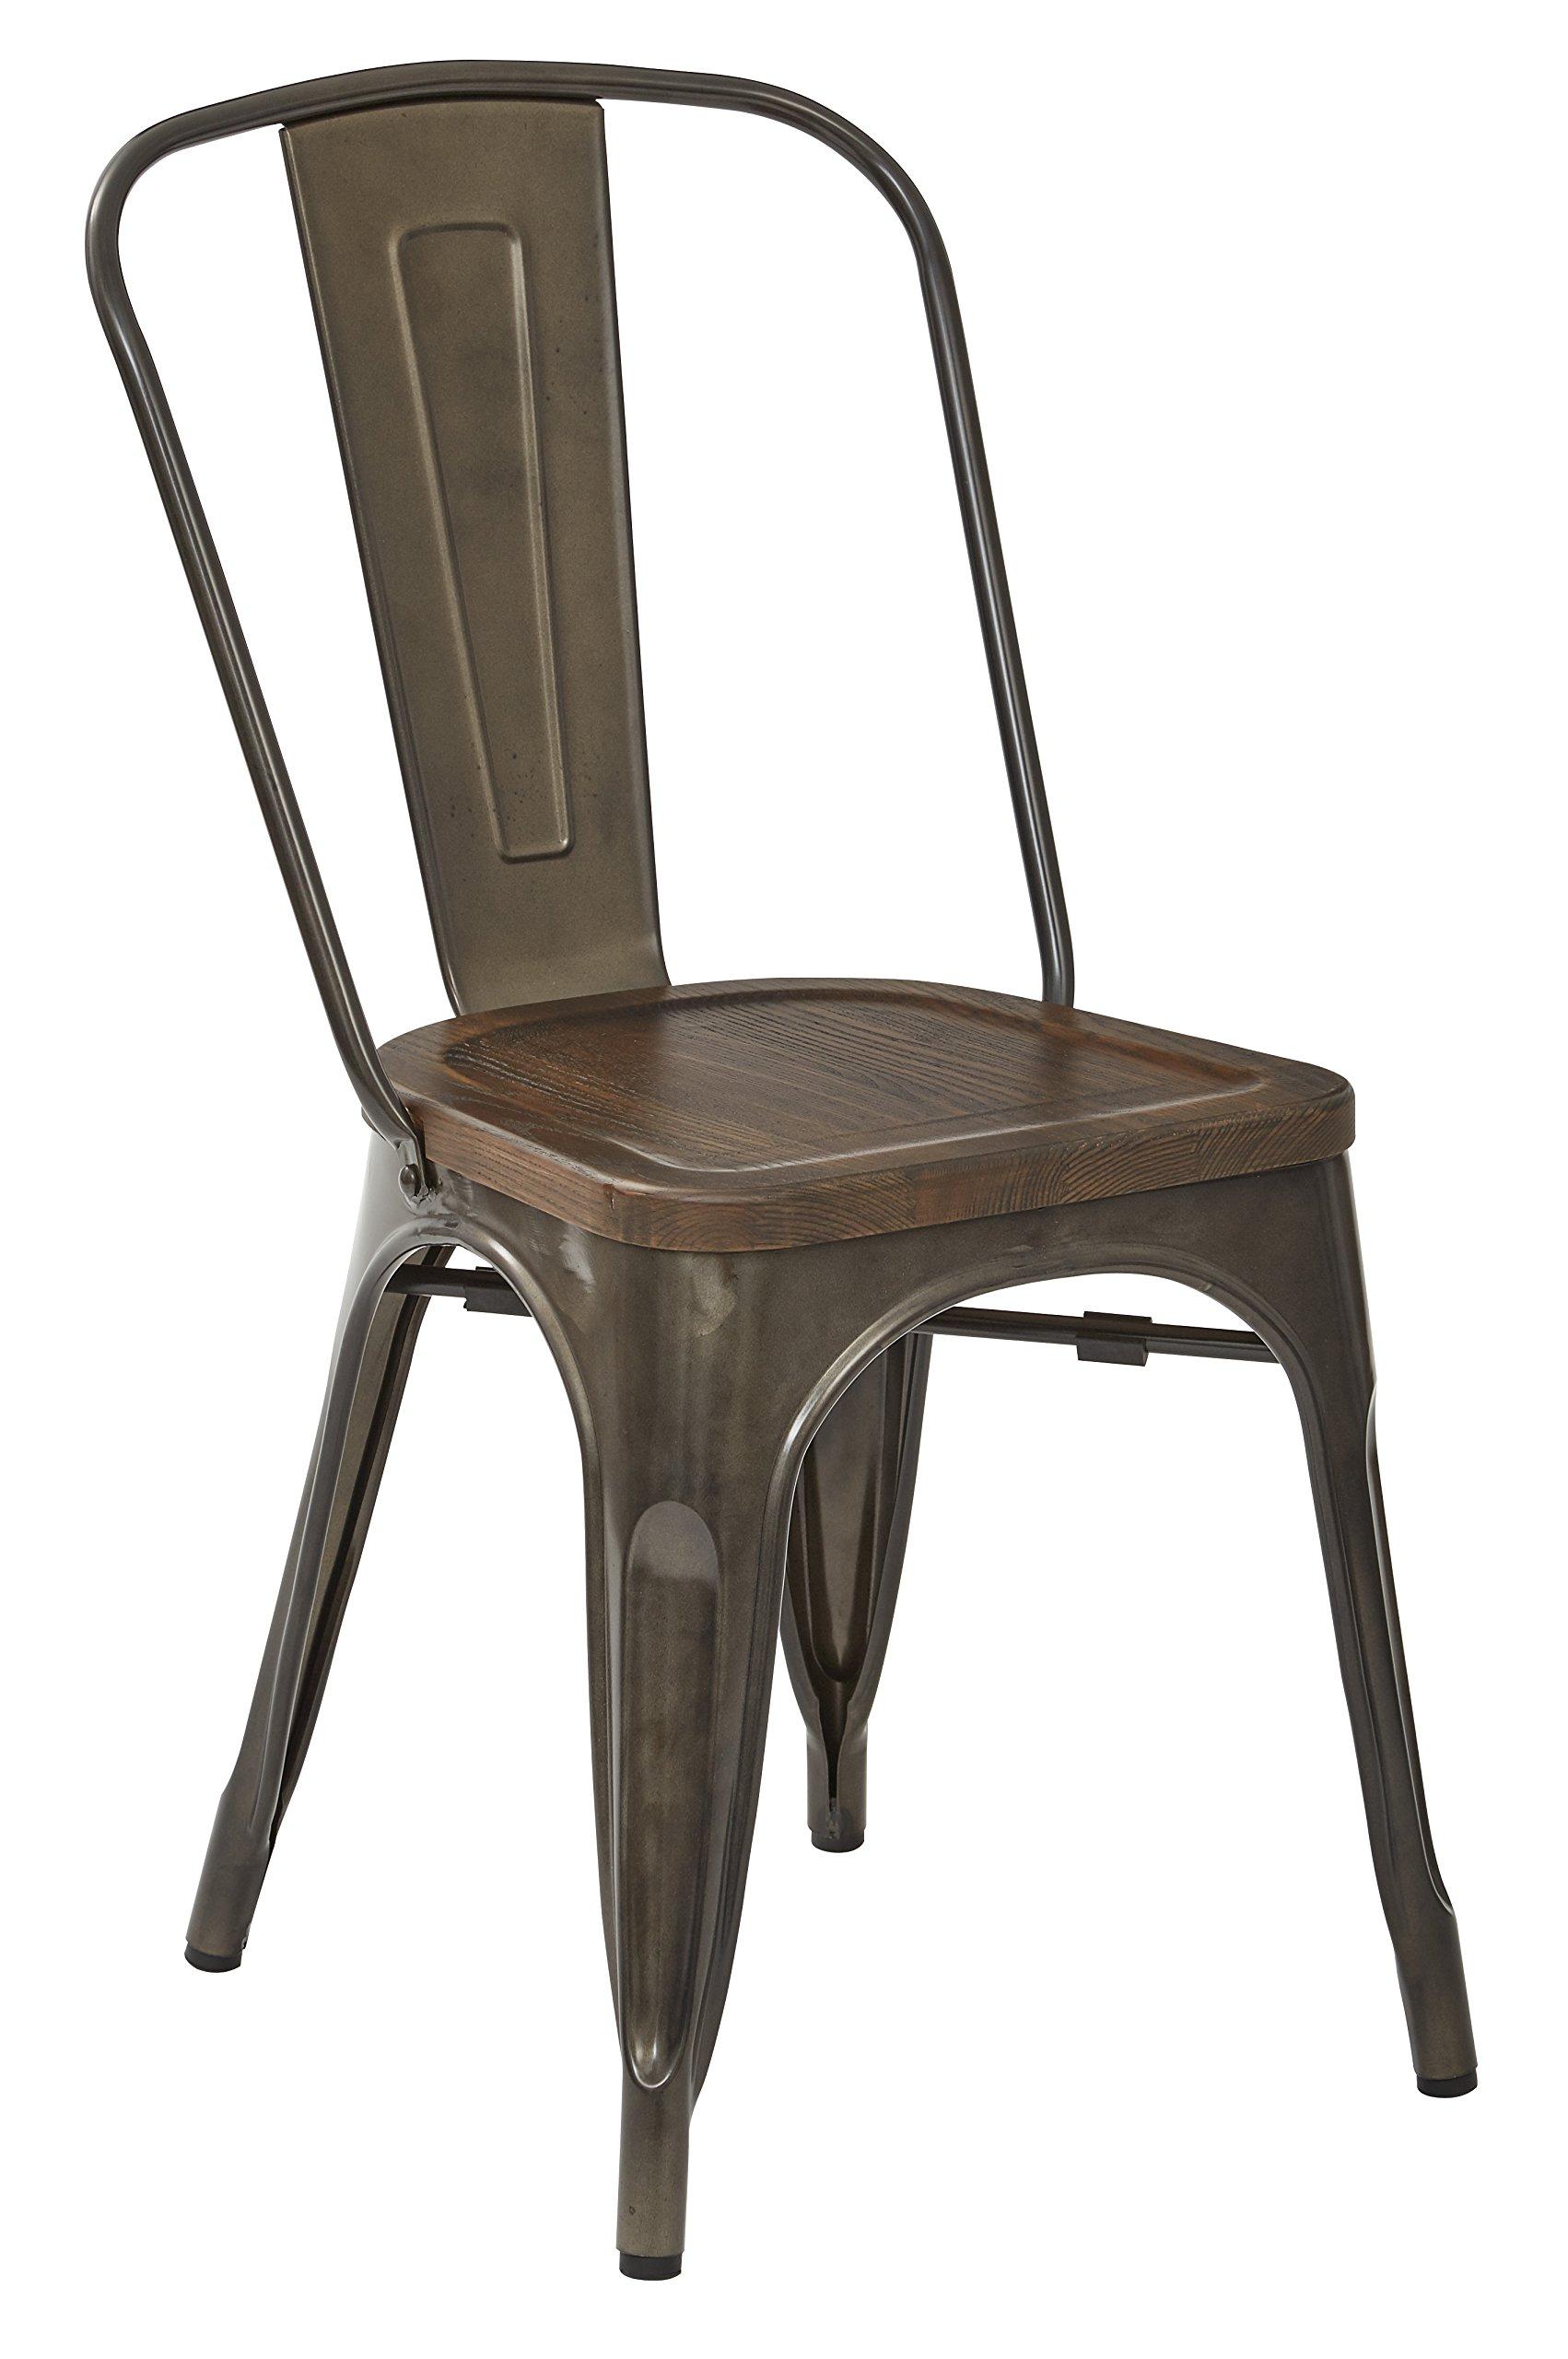 OSP Designs Indio Metal Chair with Wood Seat, Matte Gunmetal/Walnut